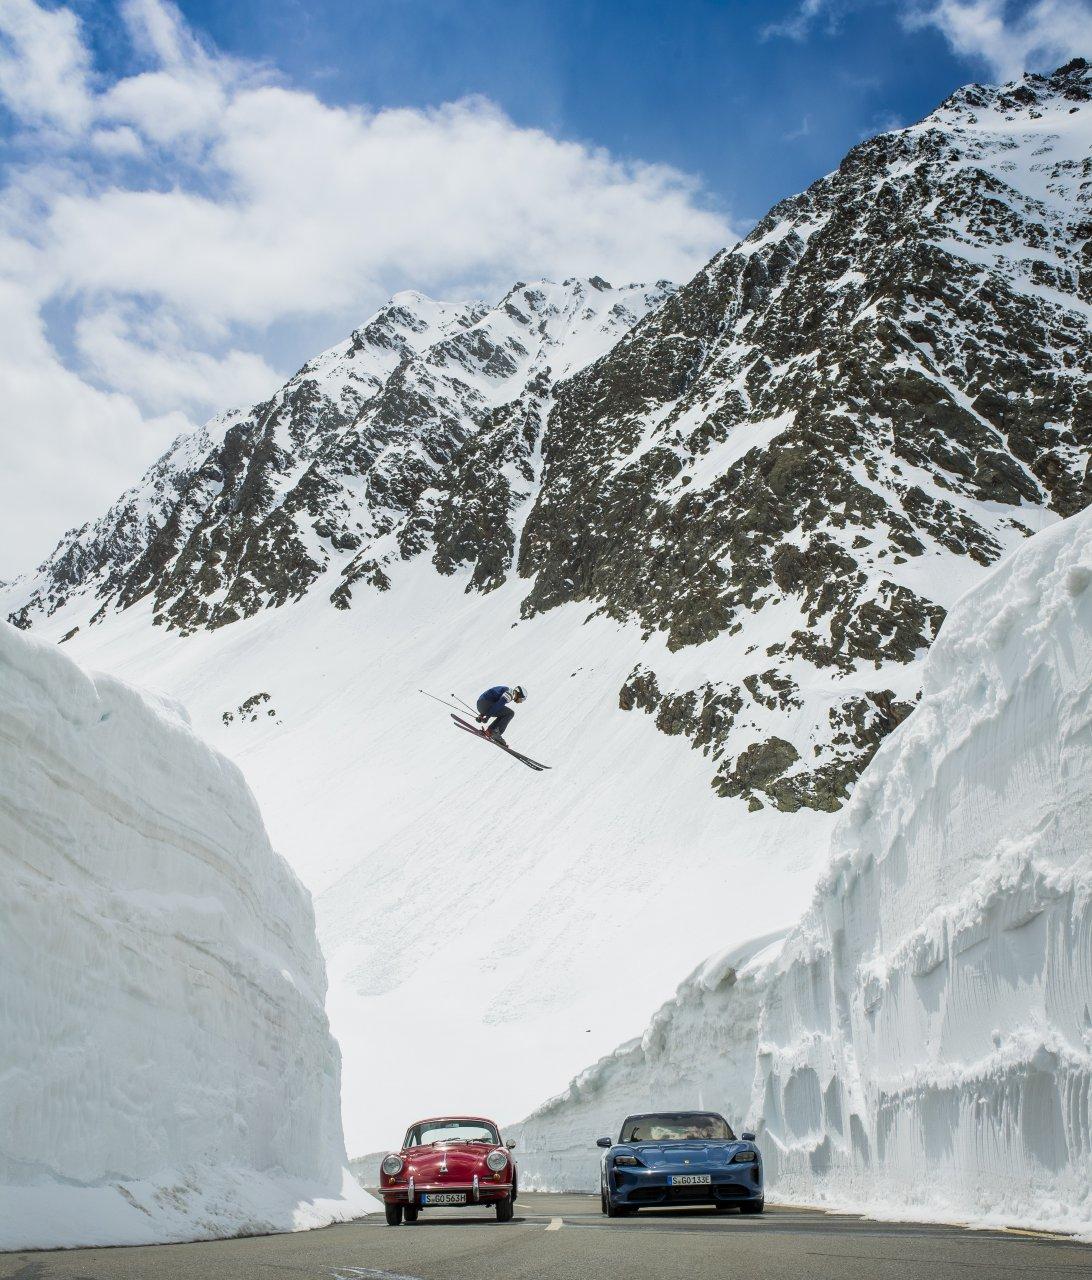 Porsche, Porsche re-creates iconic photo, 'The Jump', ClassicCars.com Journal